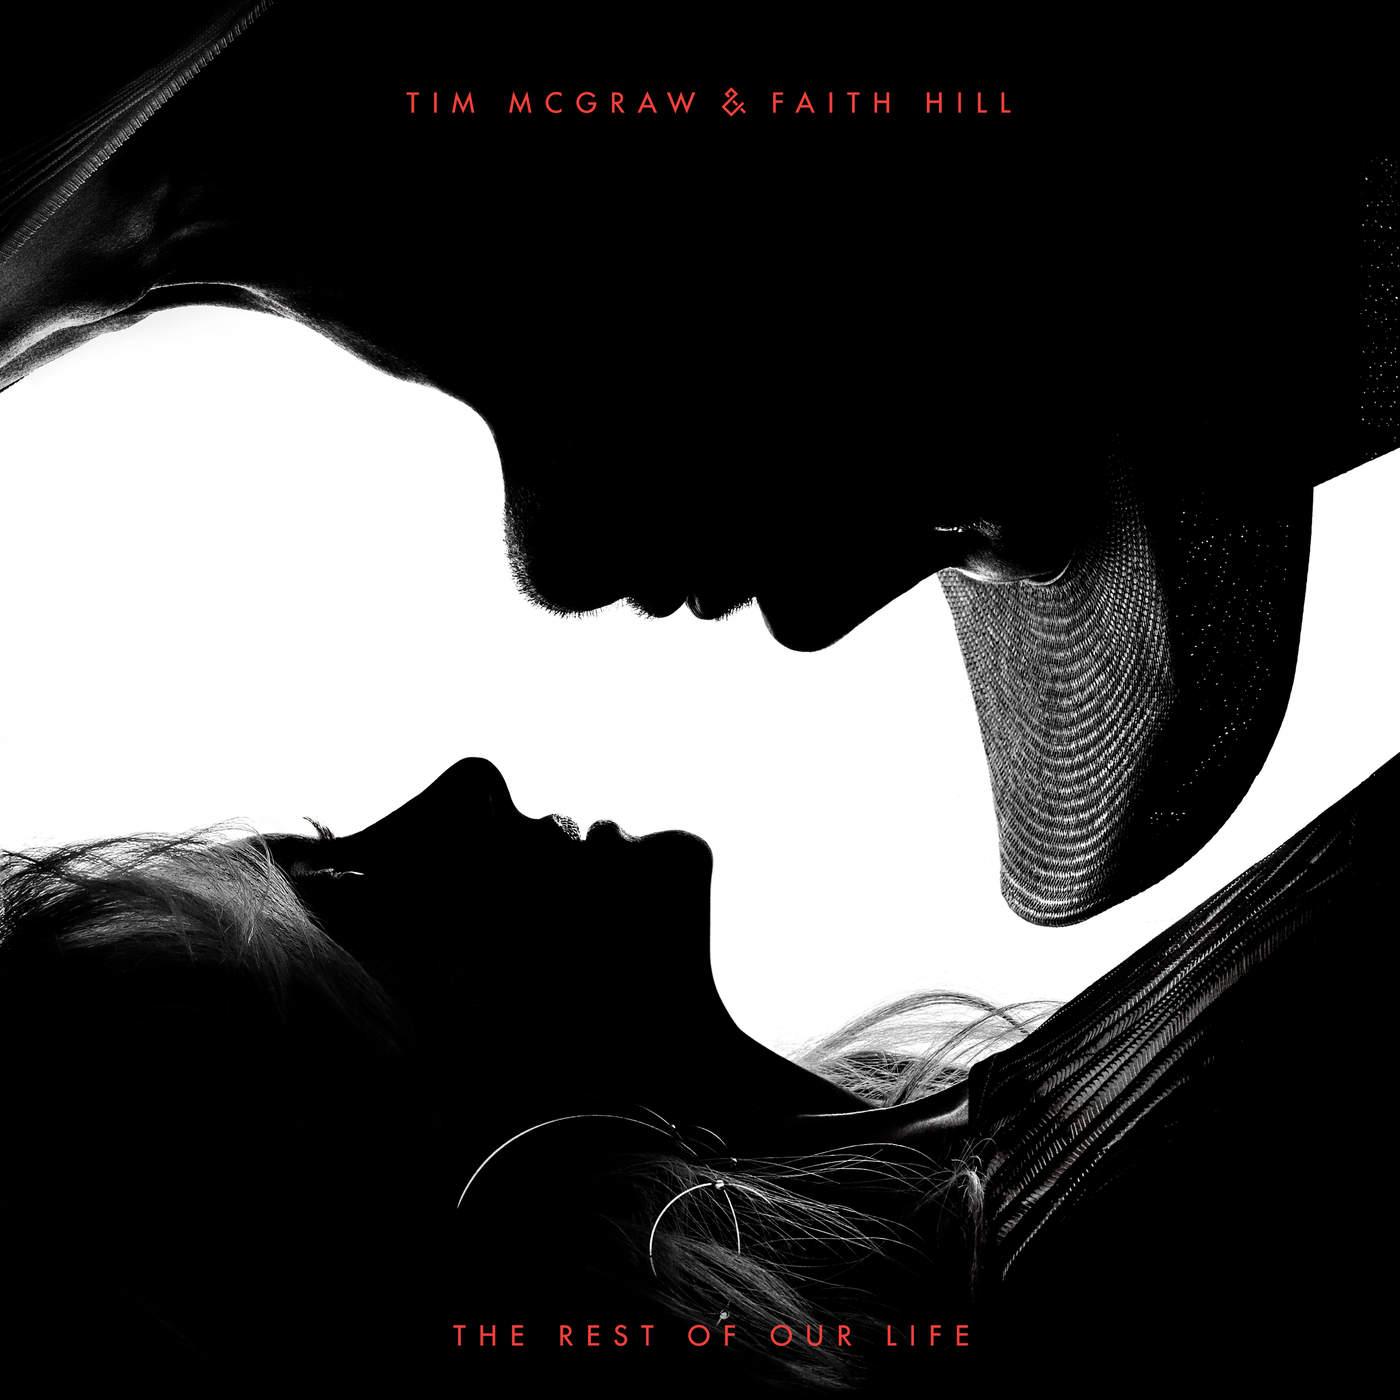 Tim McGraw & Faith Hill - Break First - Single